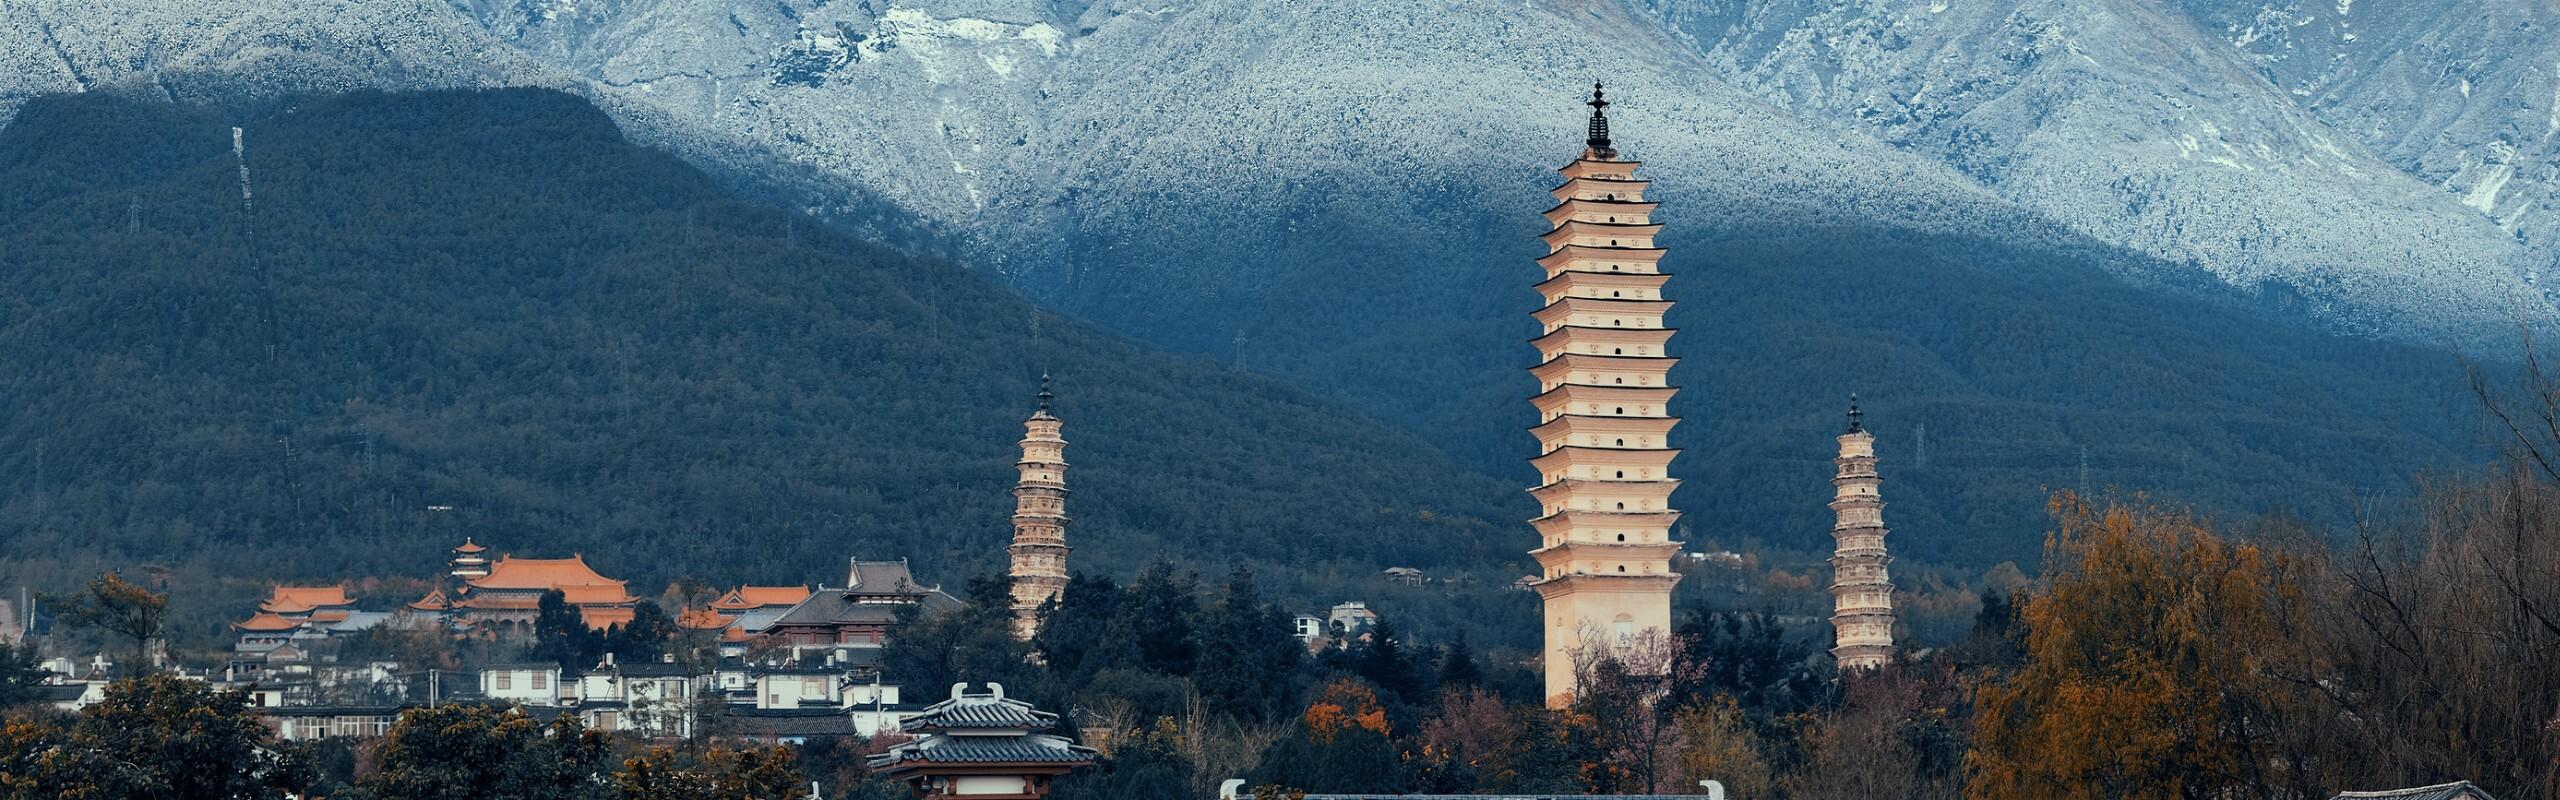 Yunnan Spotlight Experiences